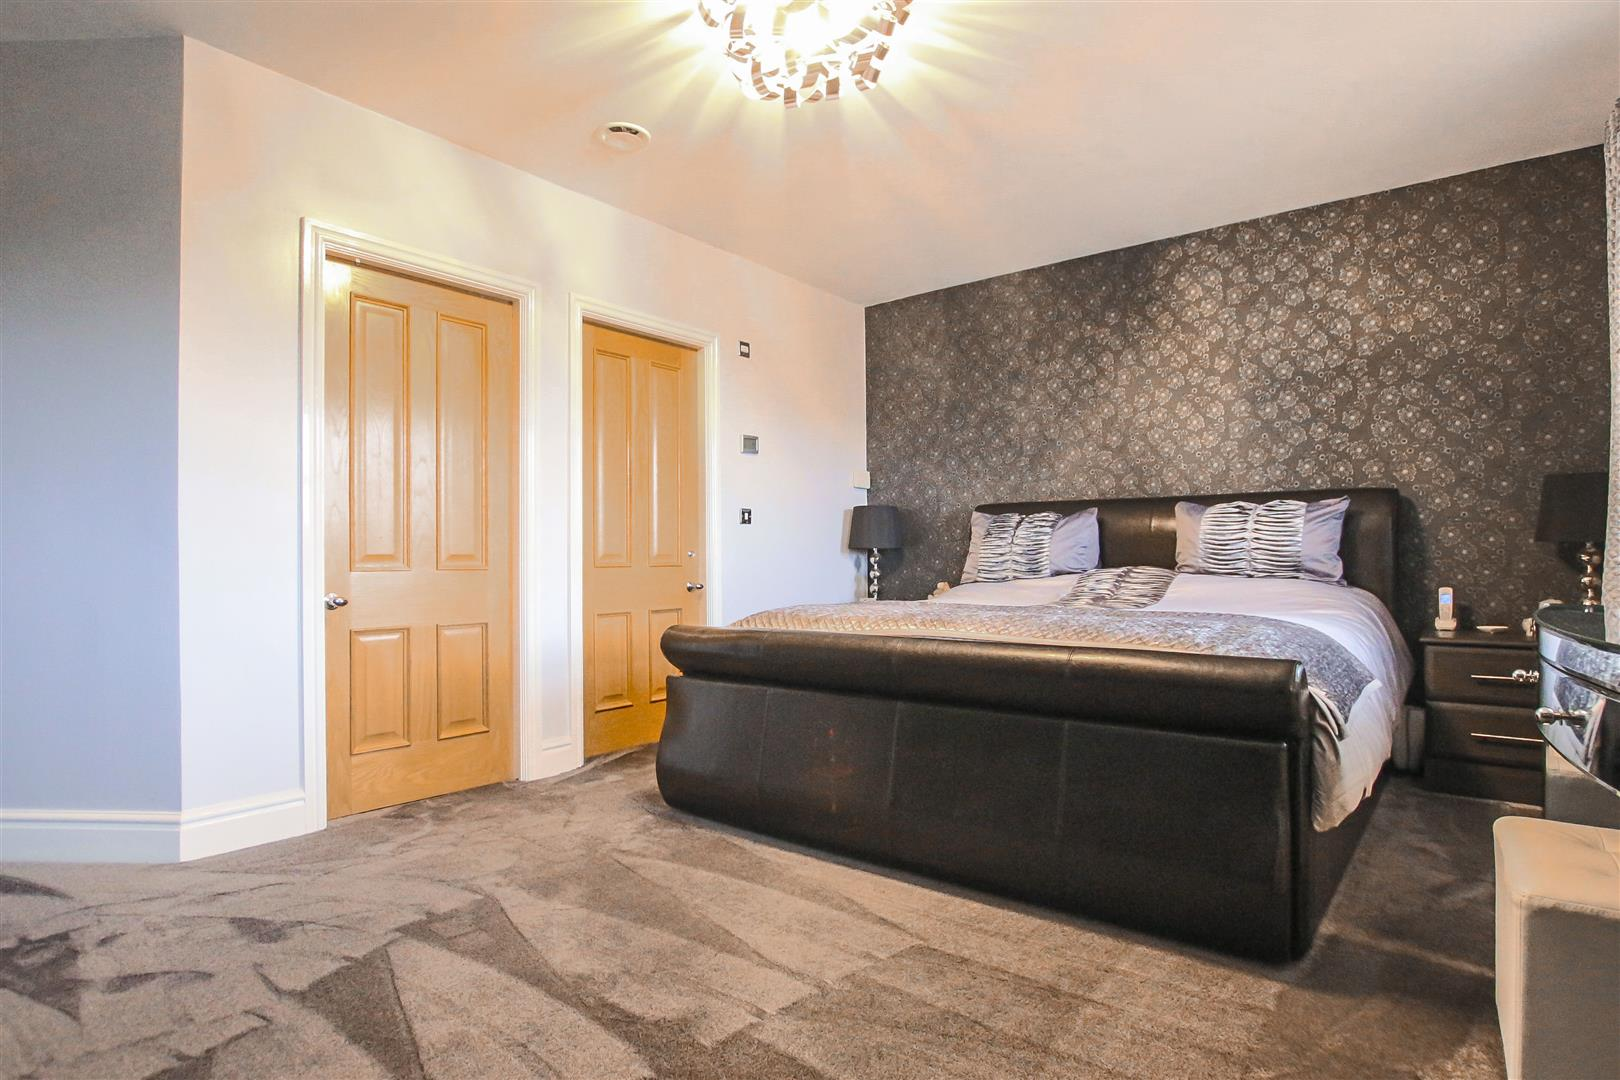 4 Bedroom Detached House For Sale - Bedroom 1